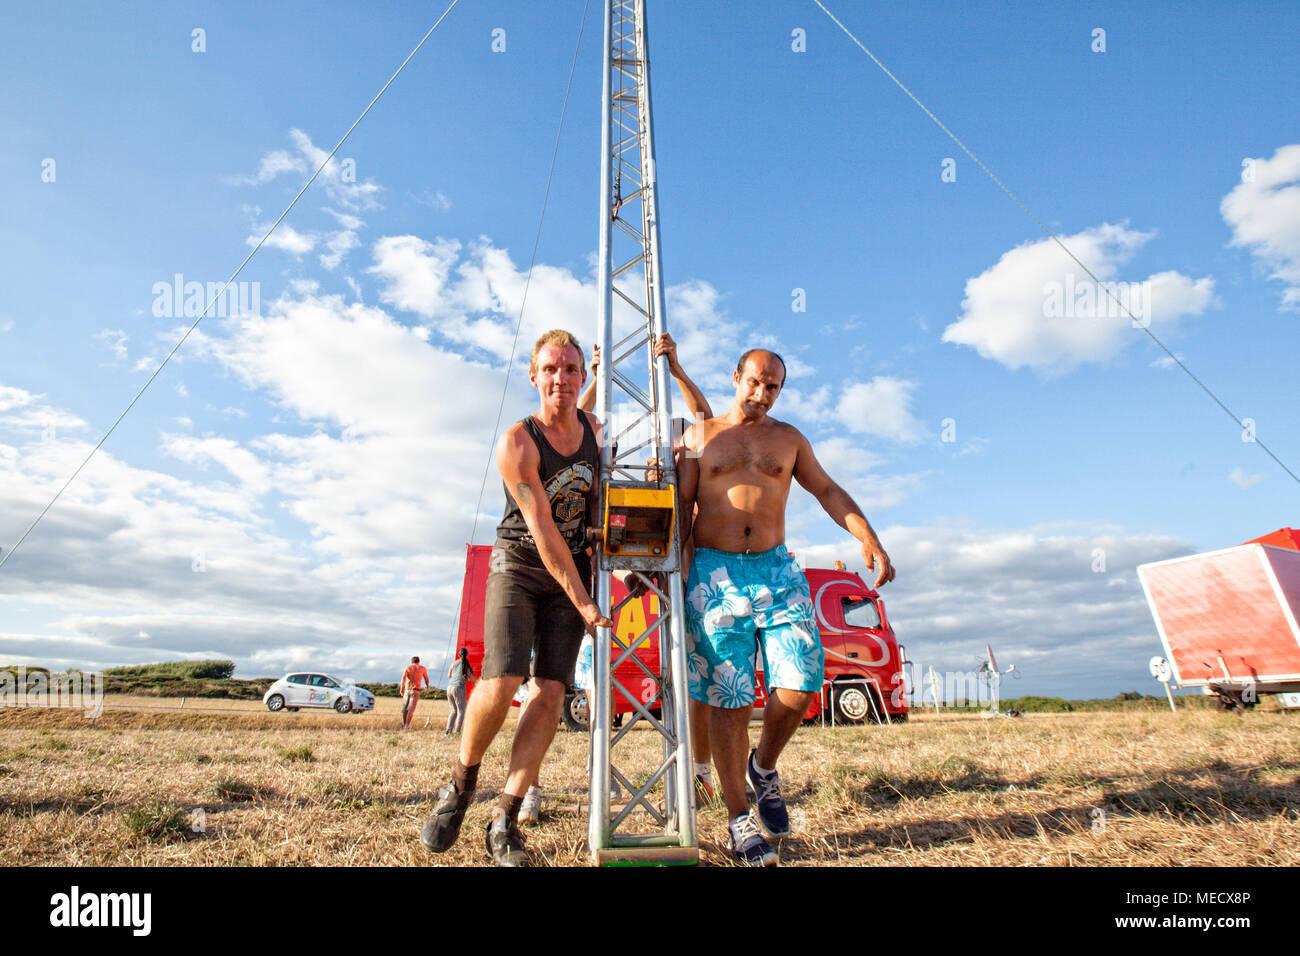 Zavatta Circus, Kerroch, Brittany, France. - Stock Image